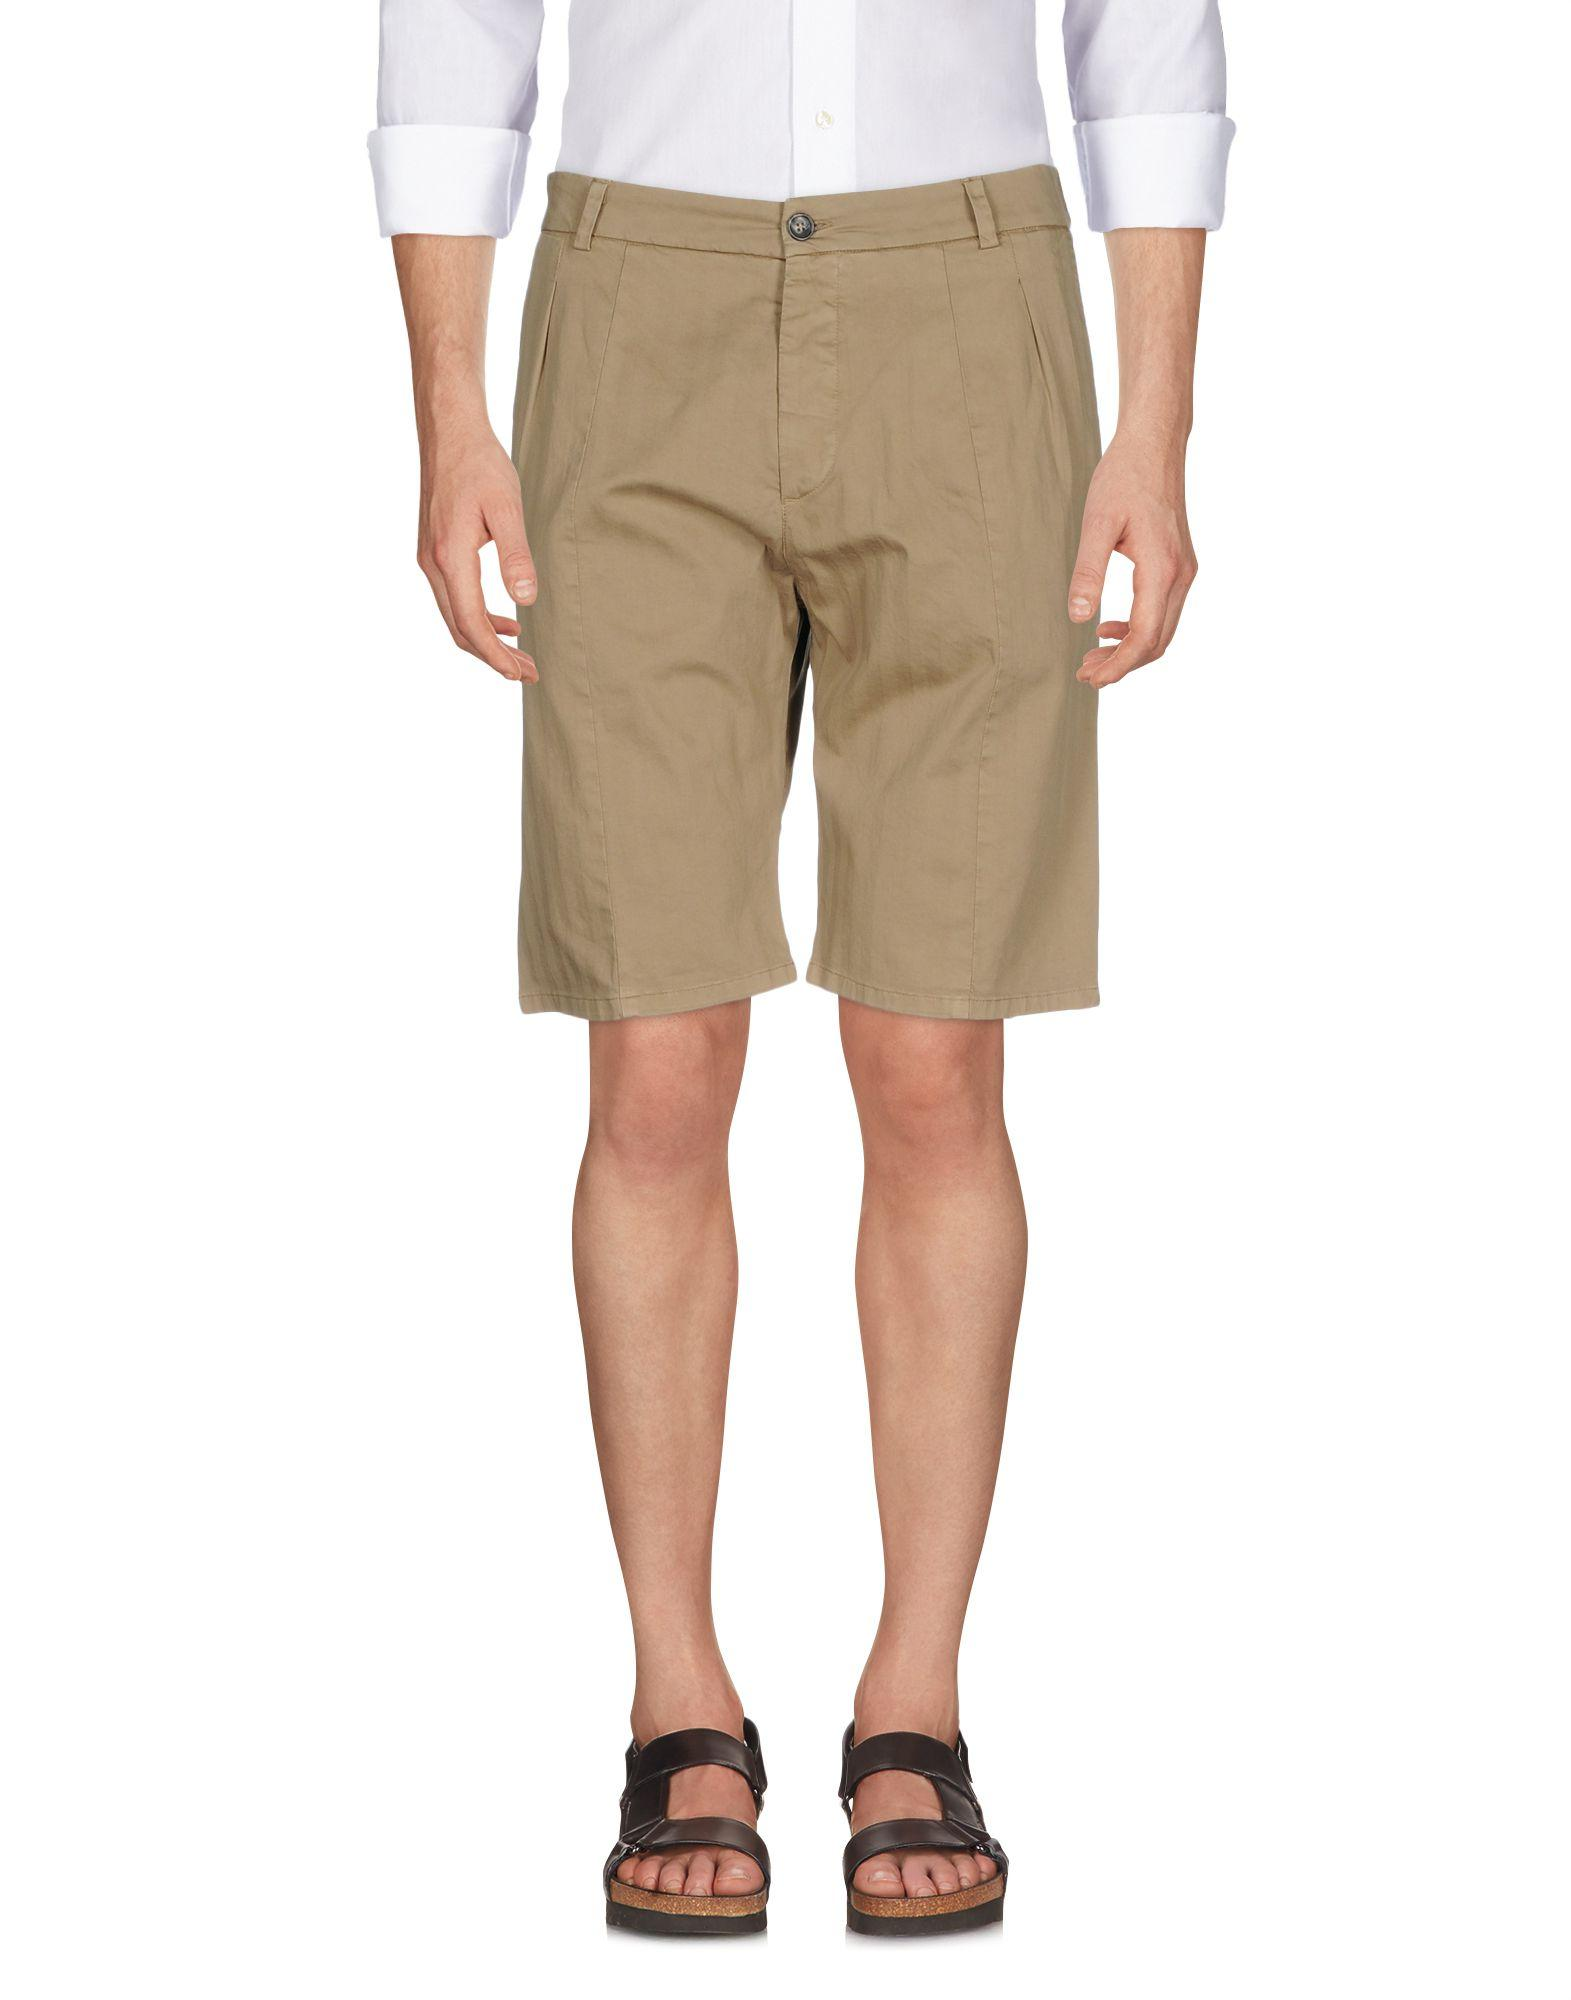 Low Brand Shorts & Bermuda In Sand